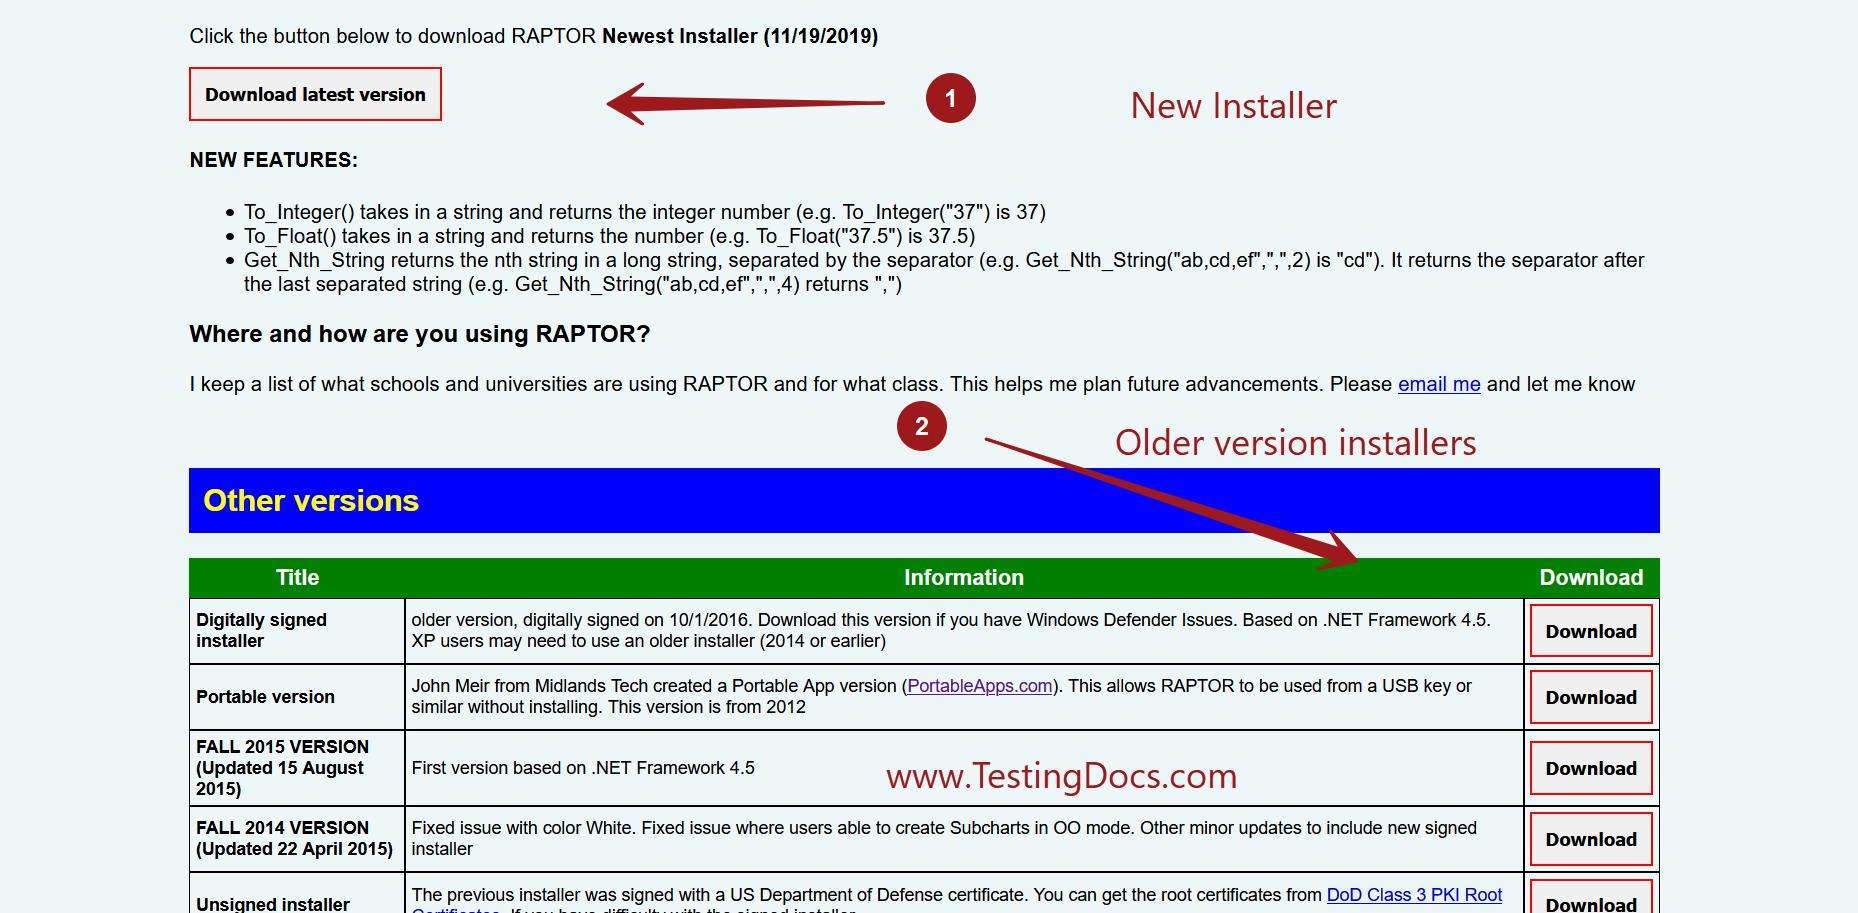 Raptor Installer New Interface